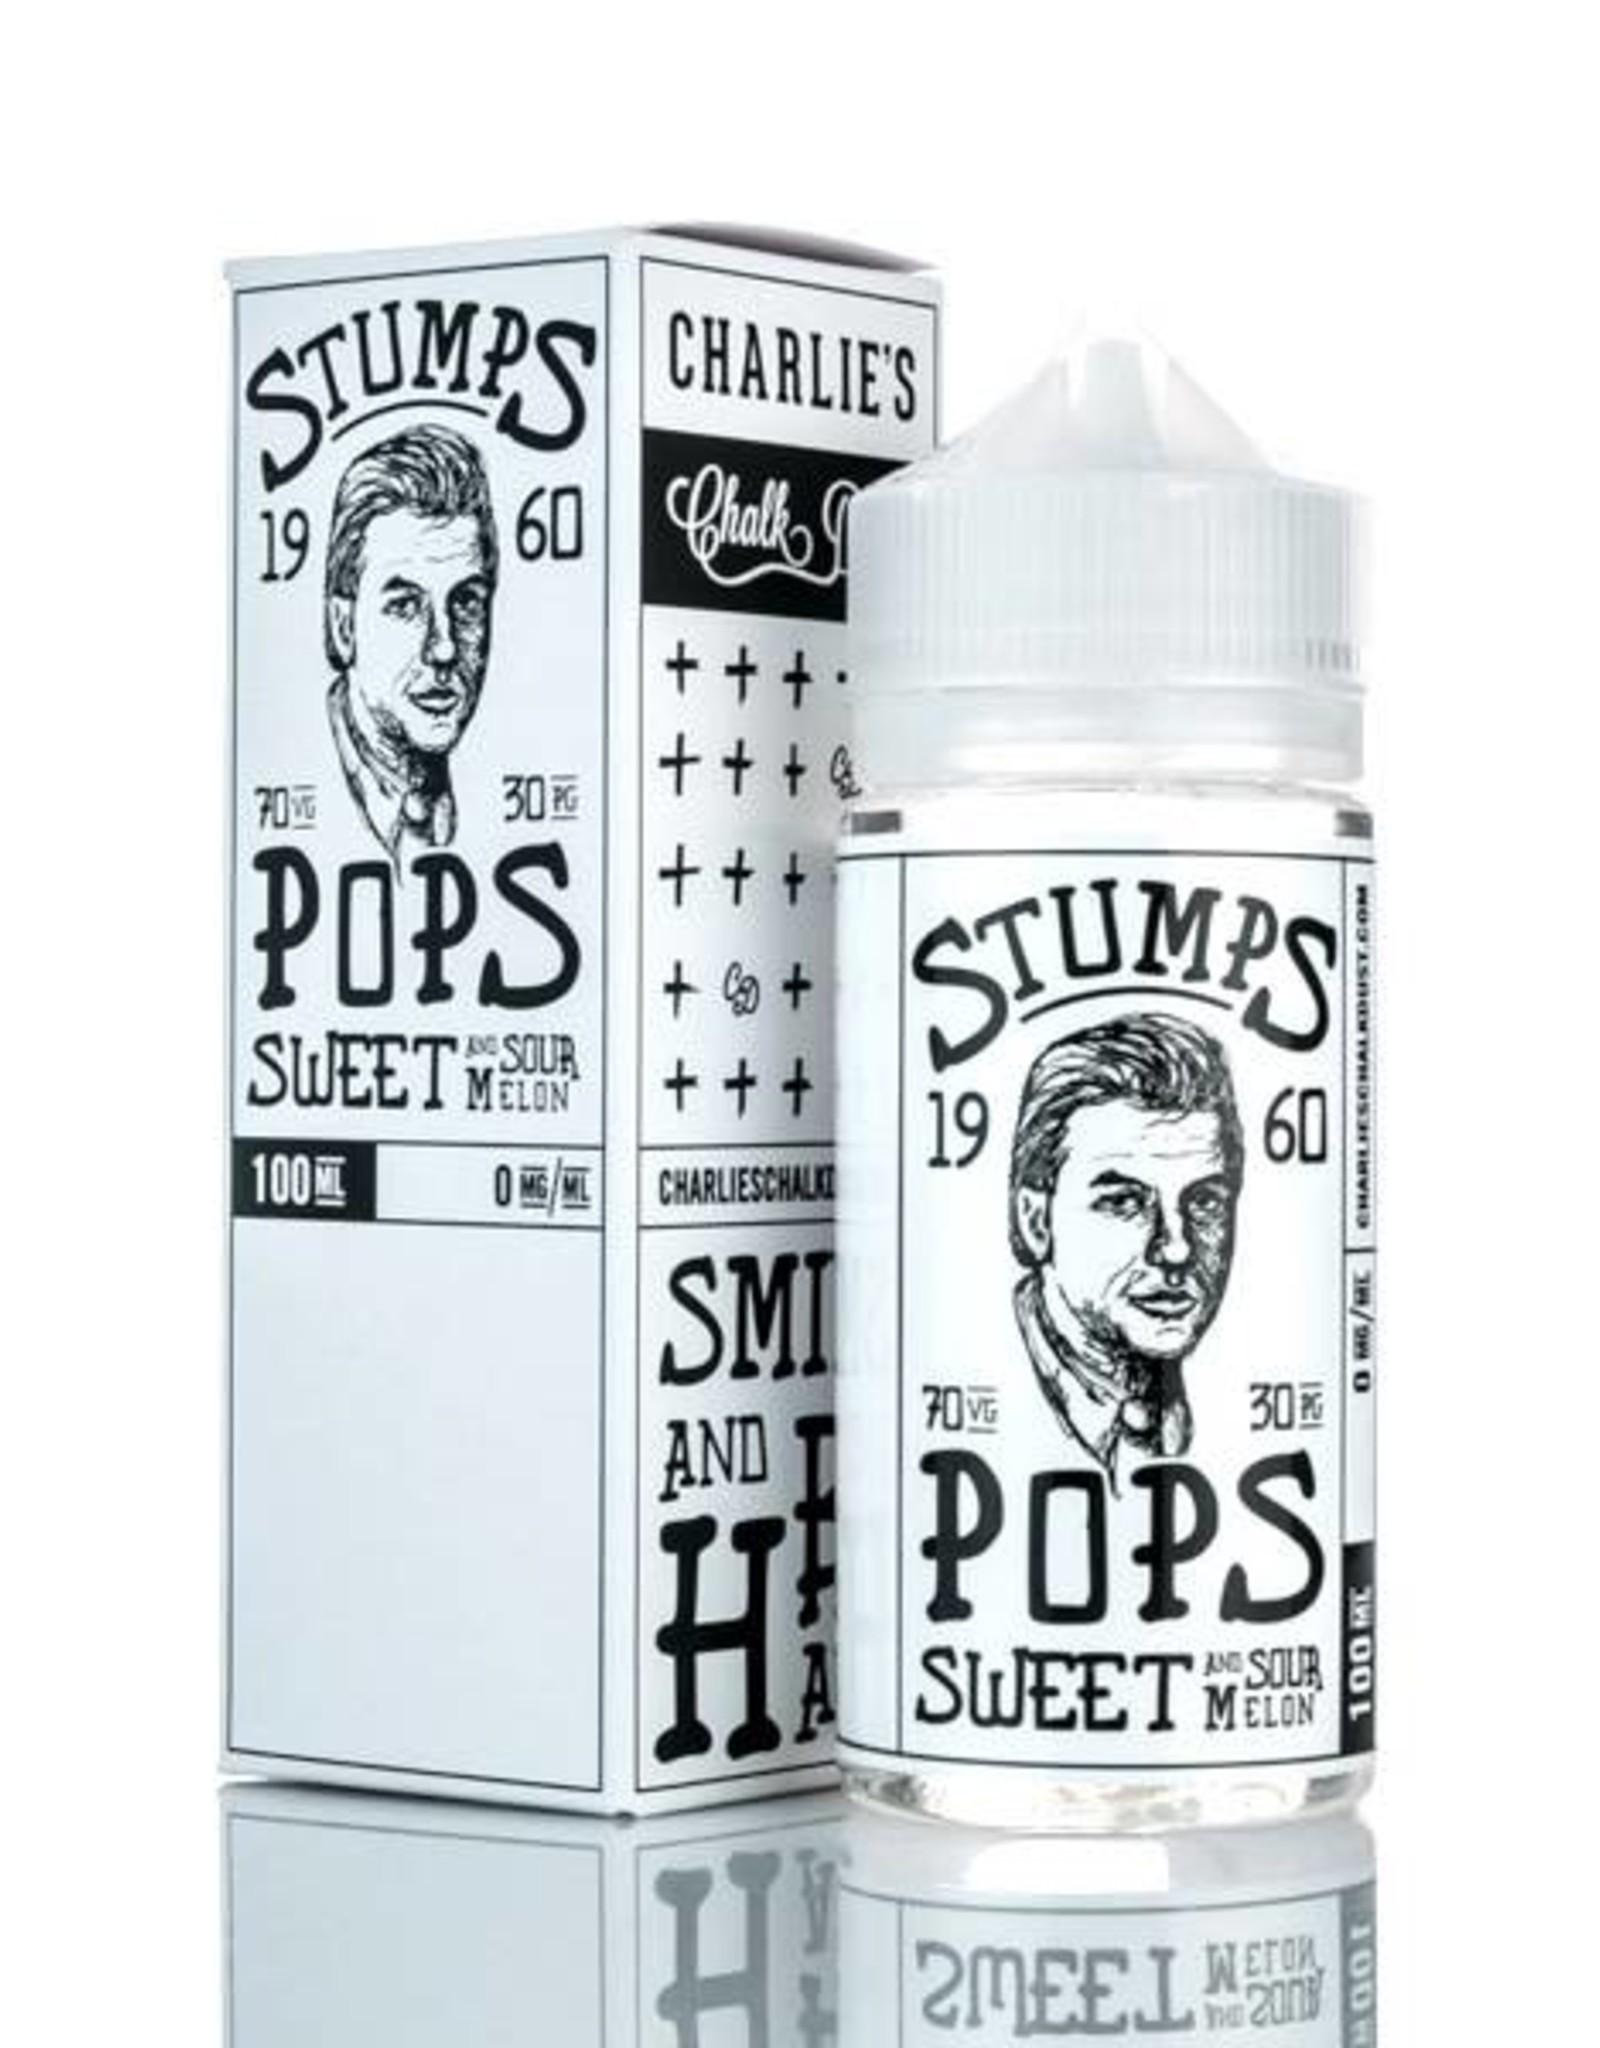 Charlie's Chalk Dust Charlie's Chalk Dust - Stumps Pops (100mL)